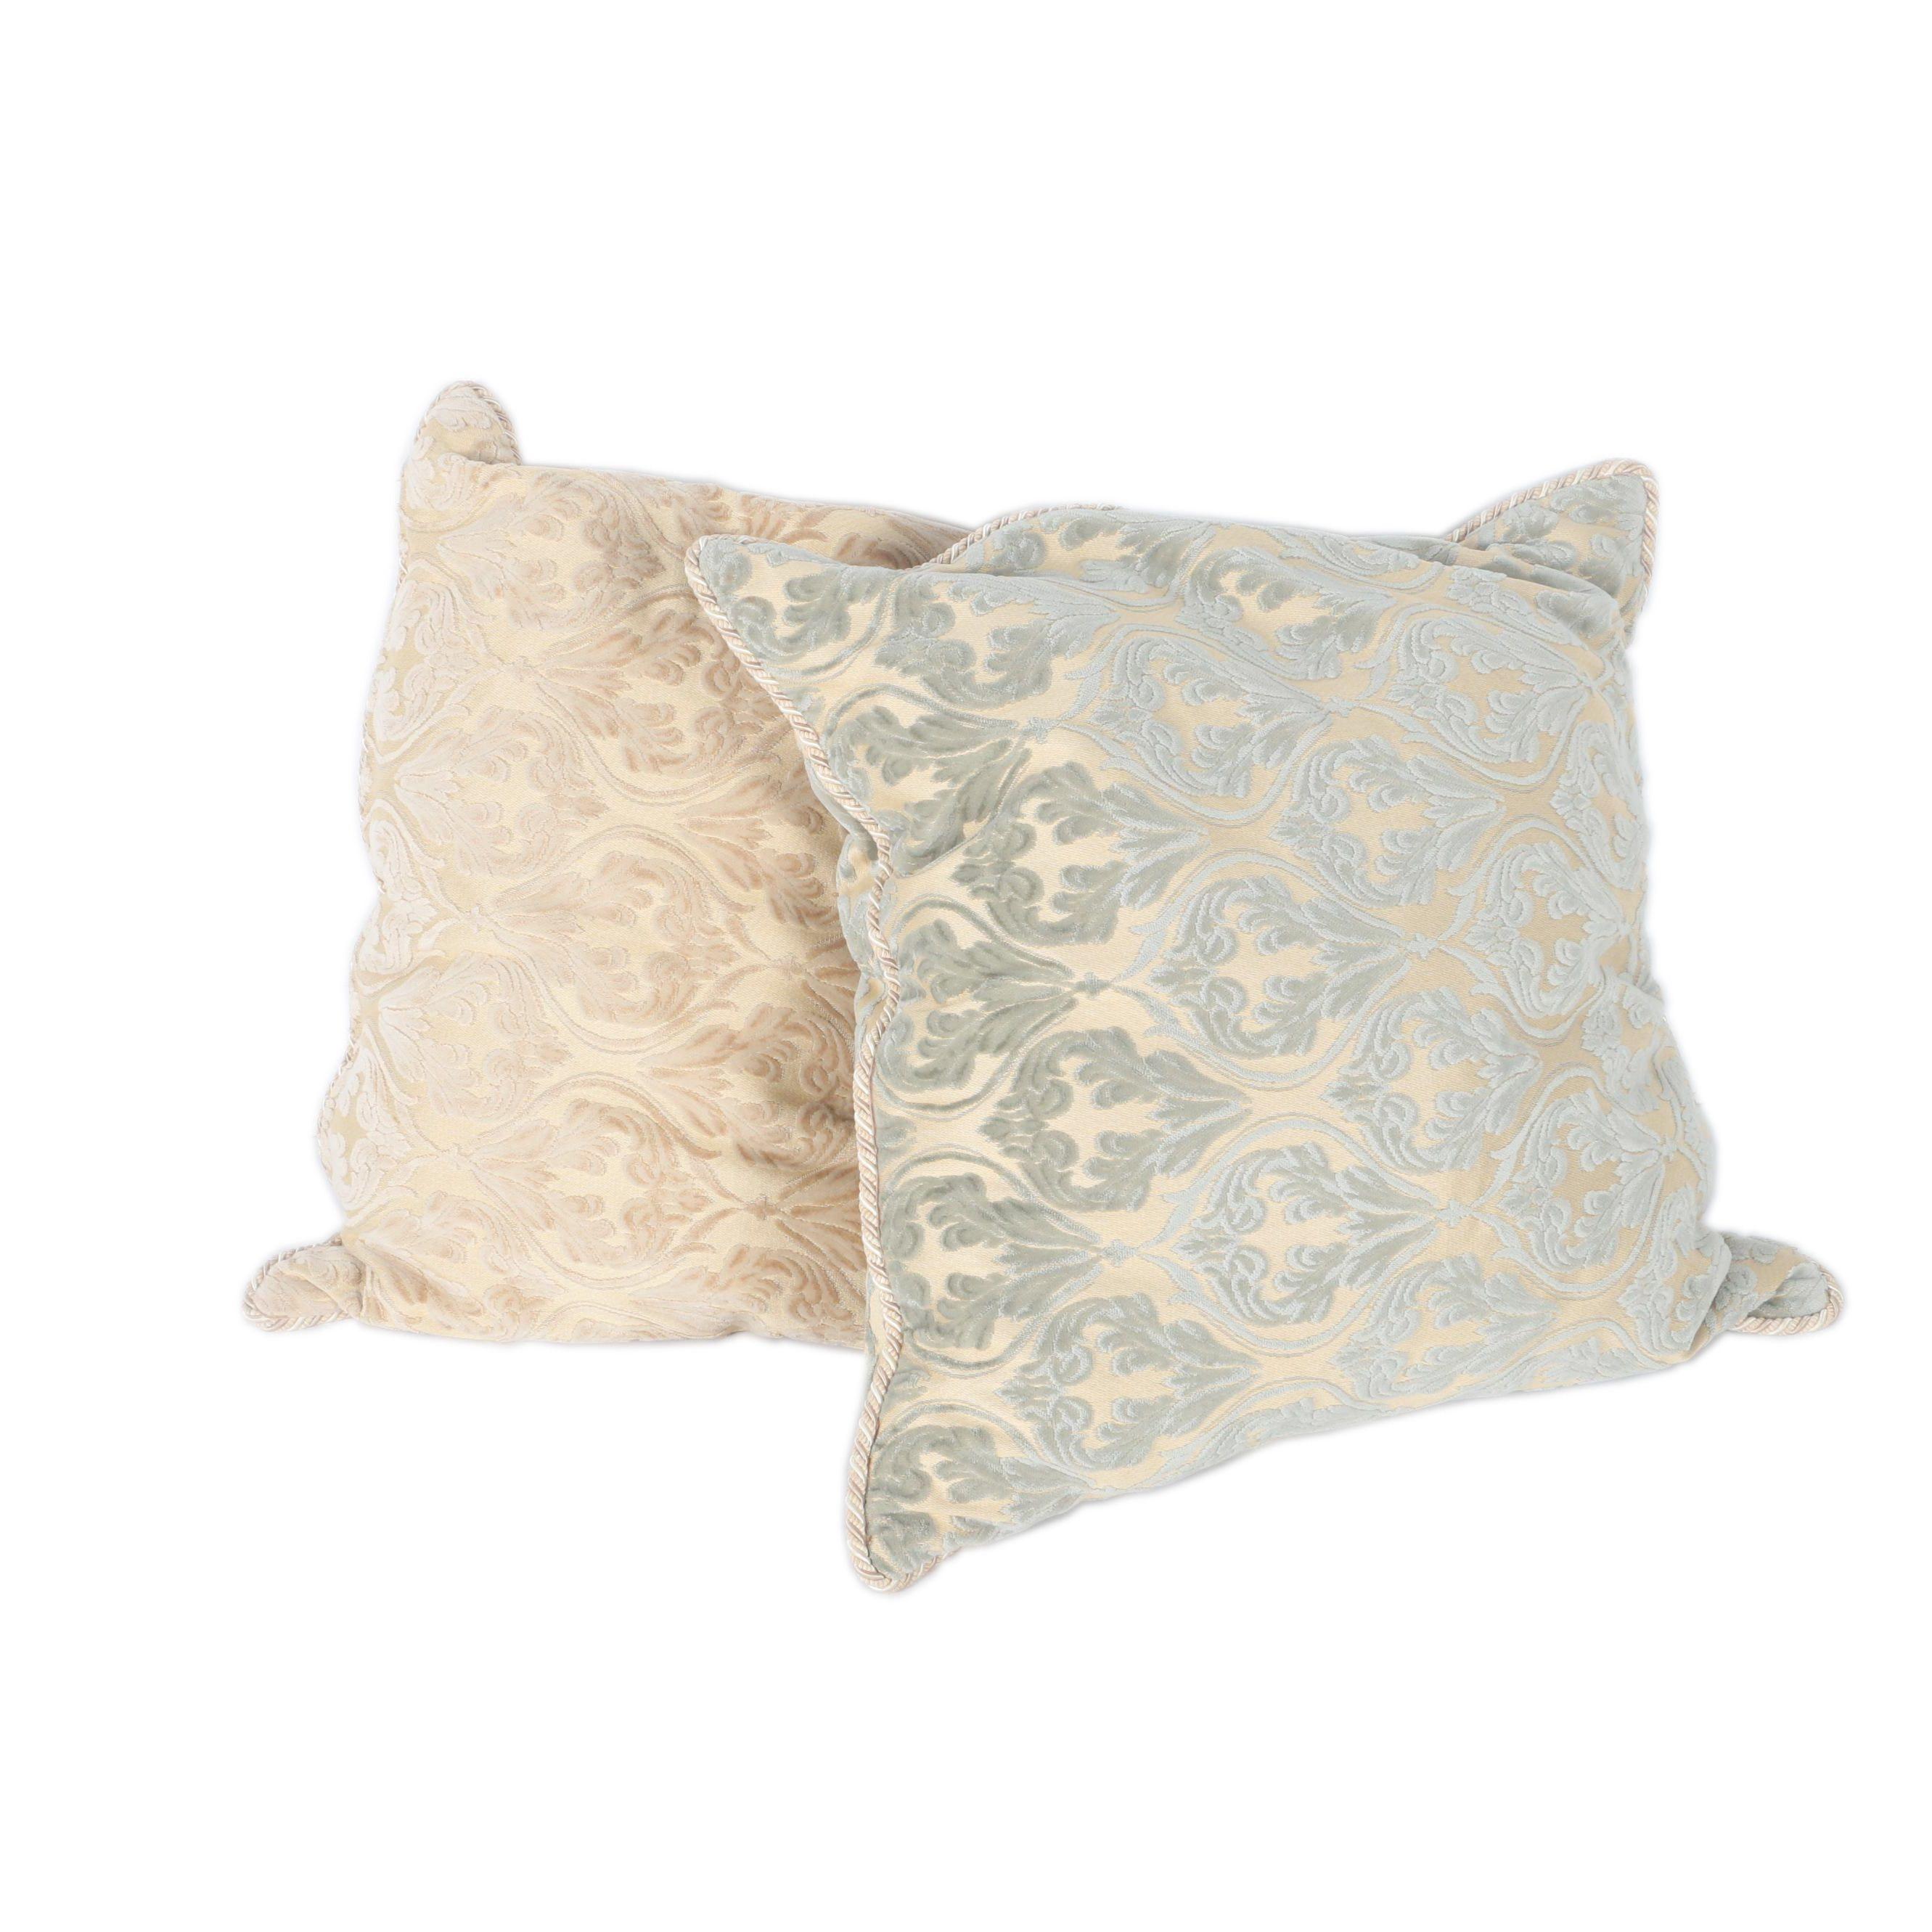 Large Chenille Damask Decorative Pillows